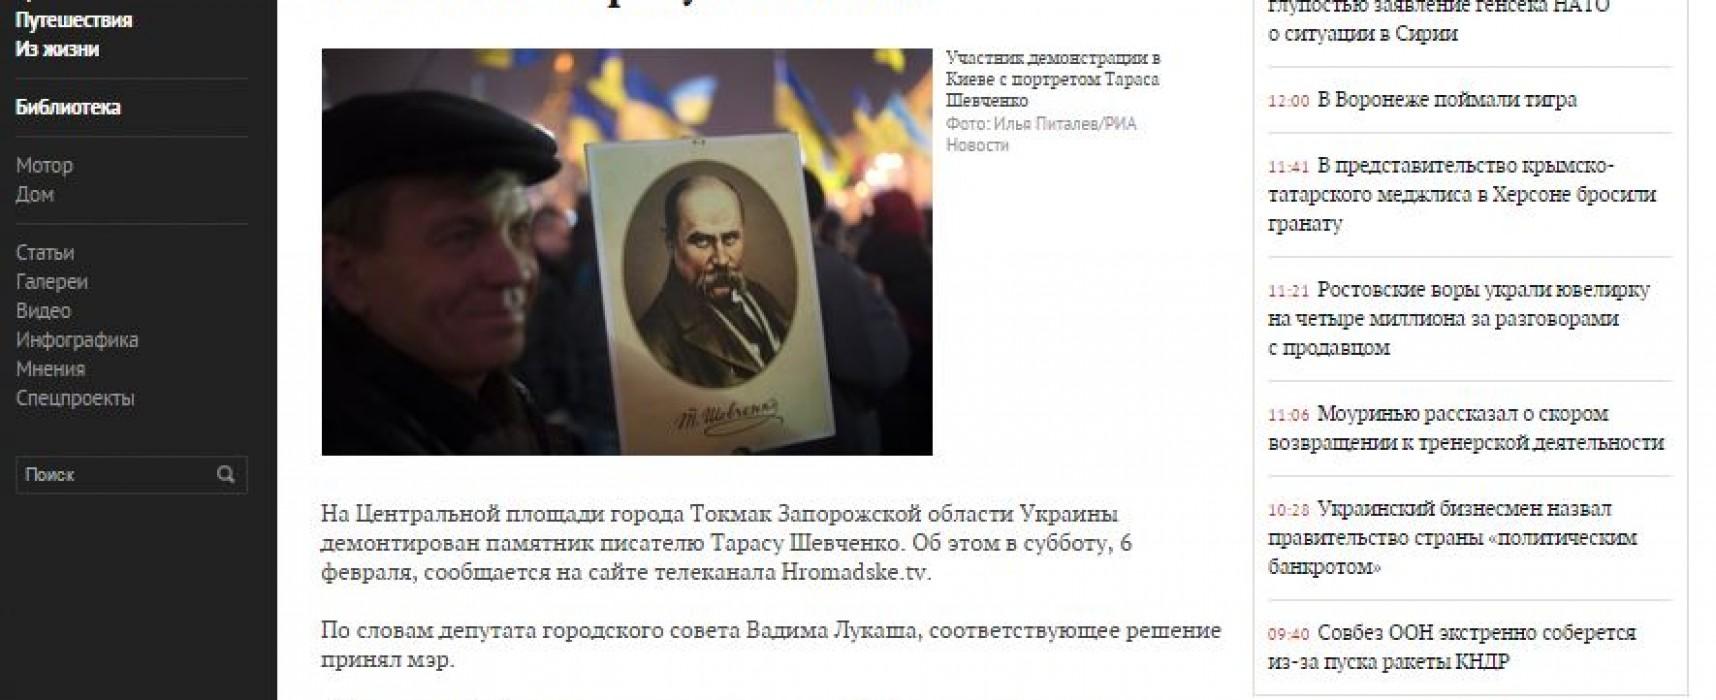 Fake: Shevchenko Statue Demolished in Zaporizhzhia Region